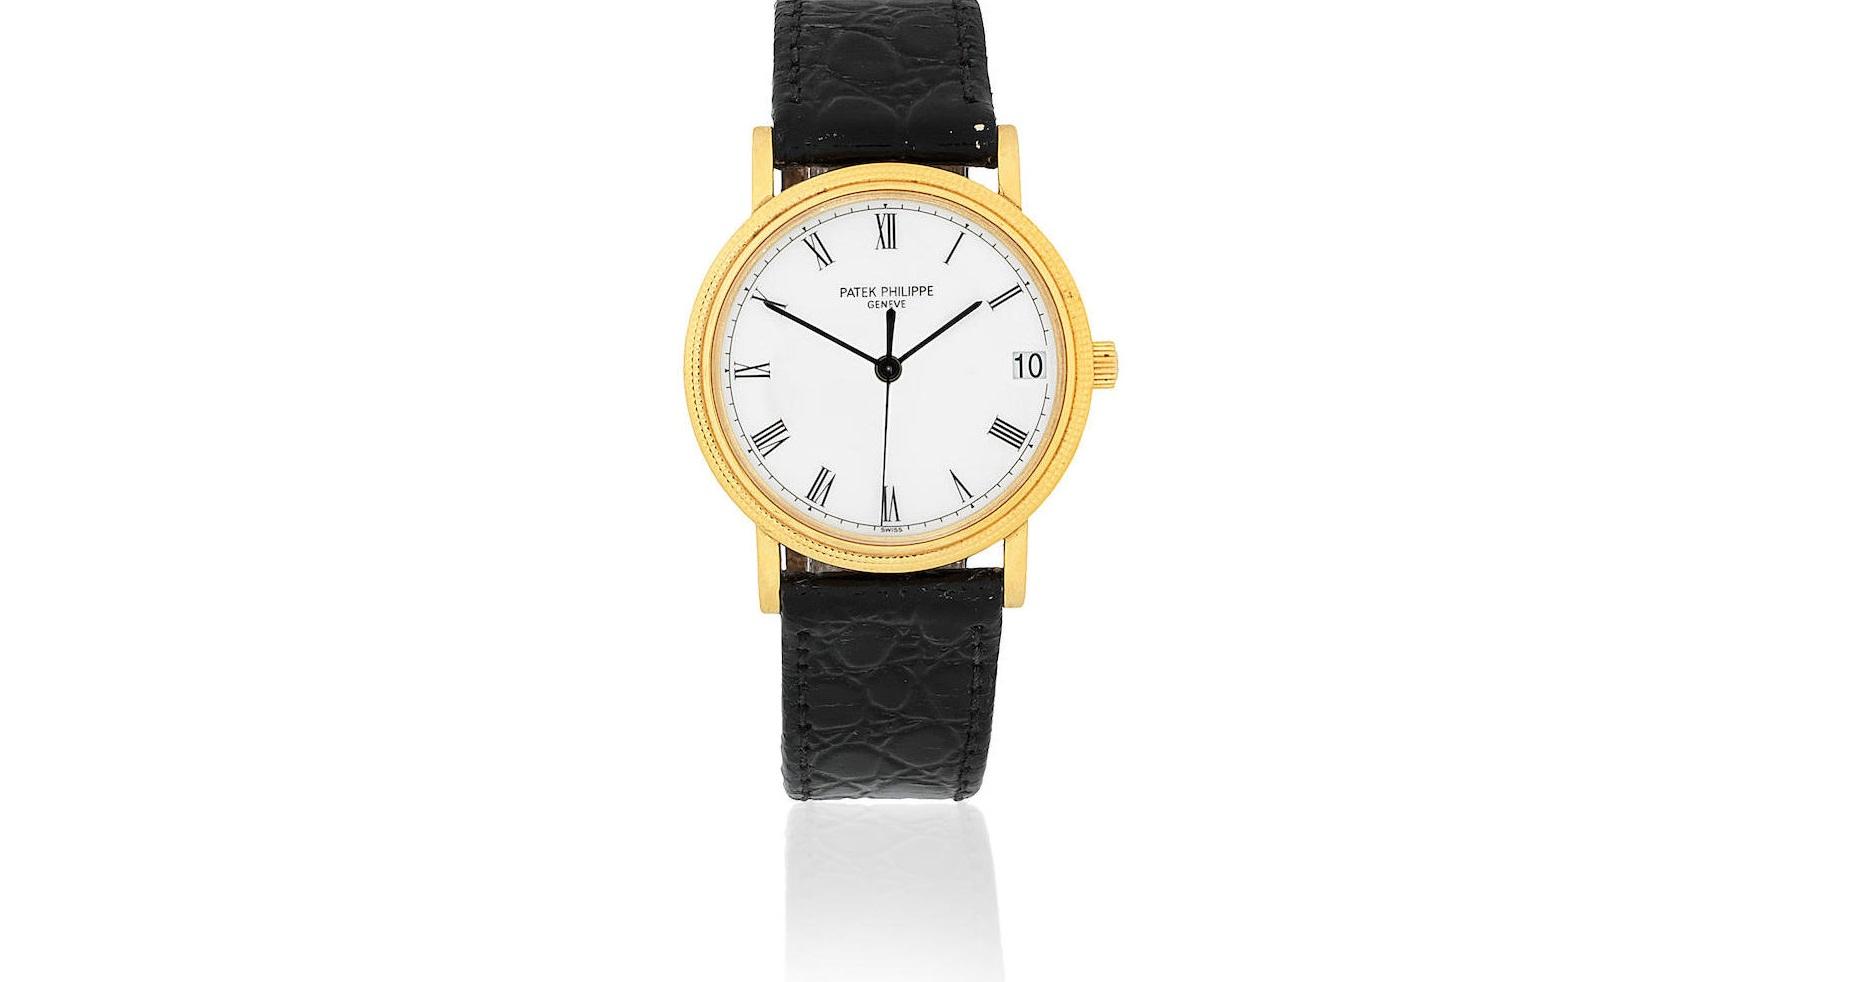 Lot 11 - Patek Philippe. An 18K gold automatic calendar wristwatch